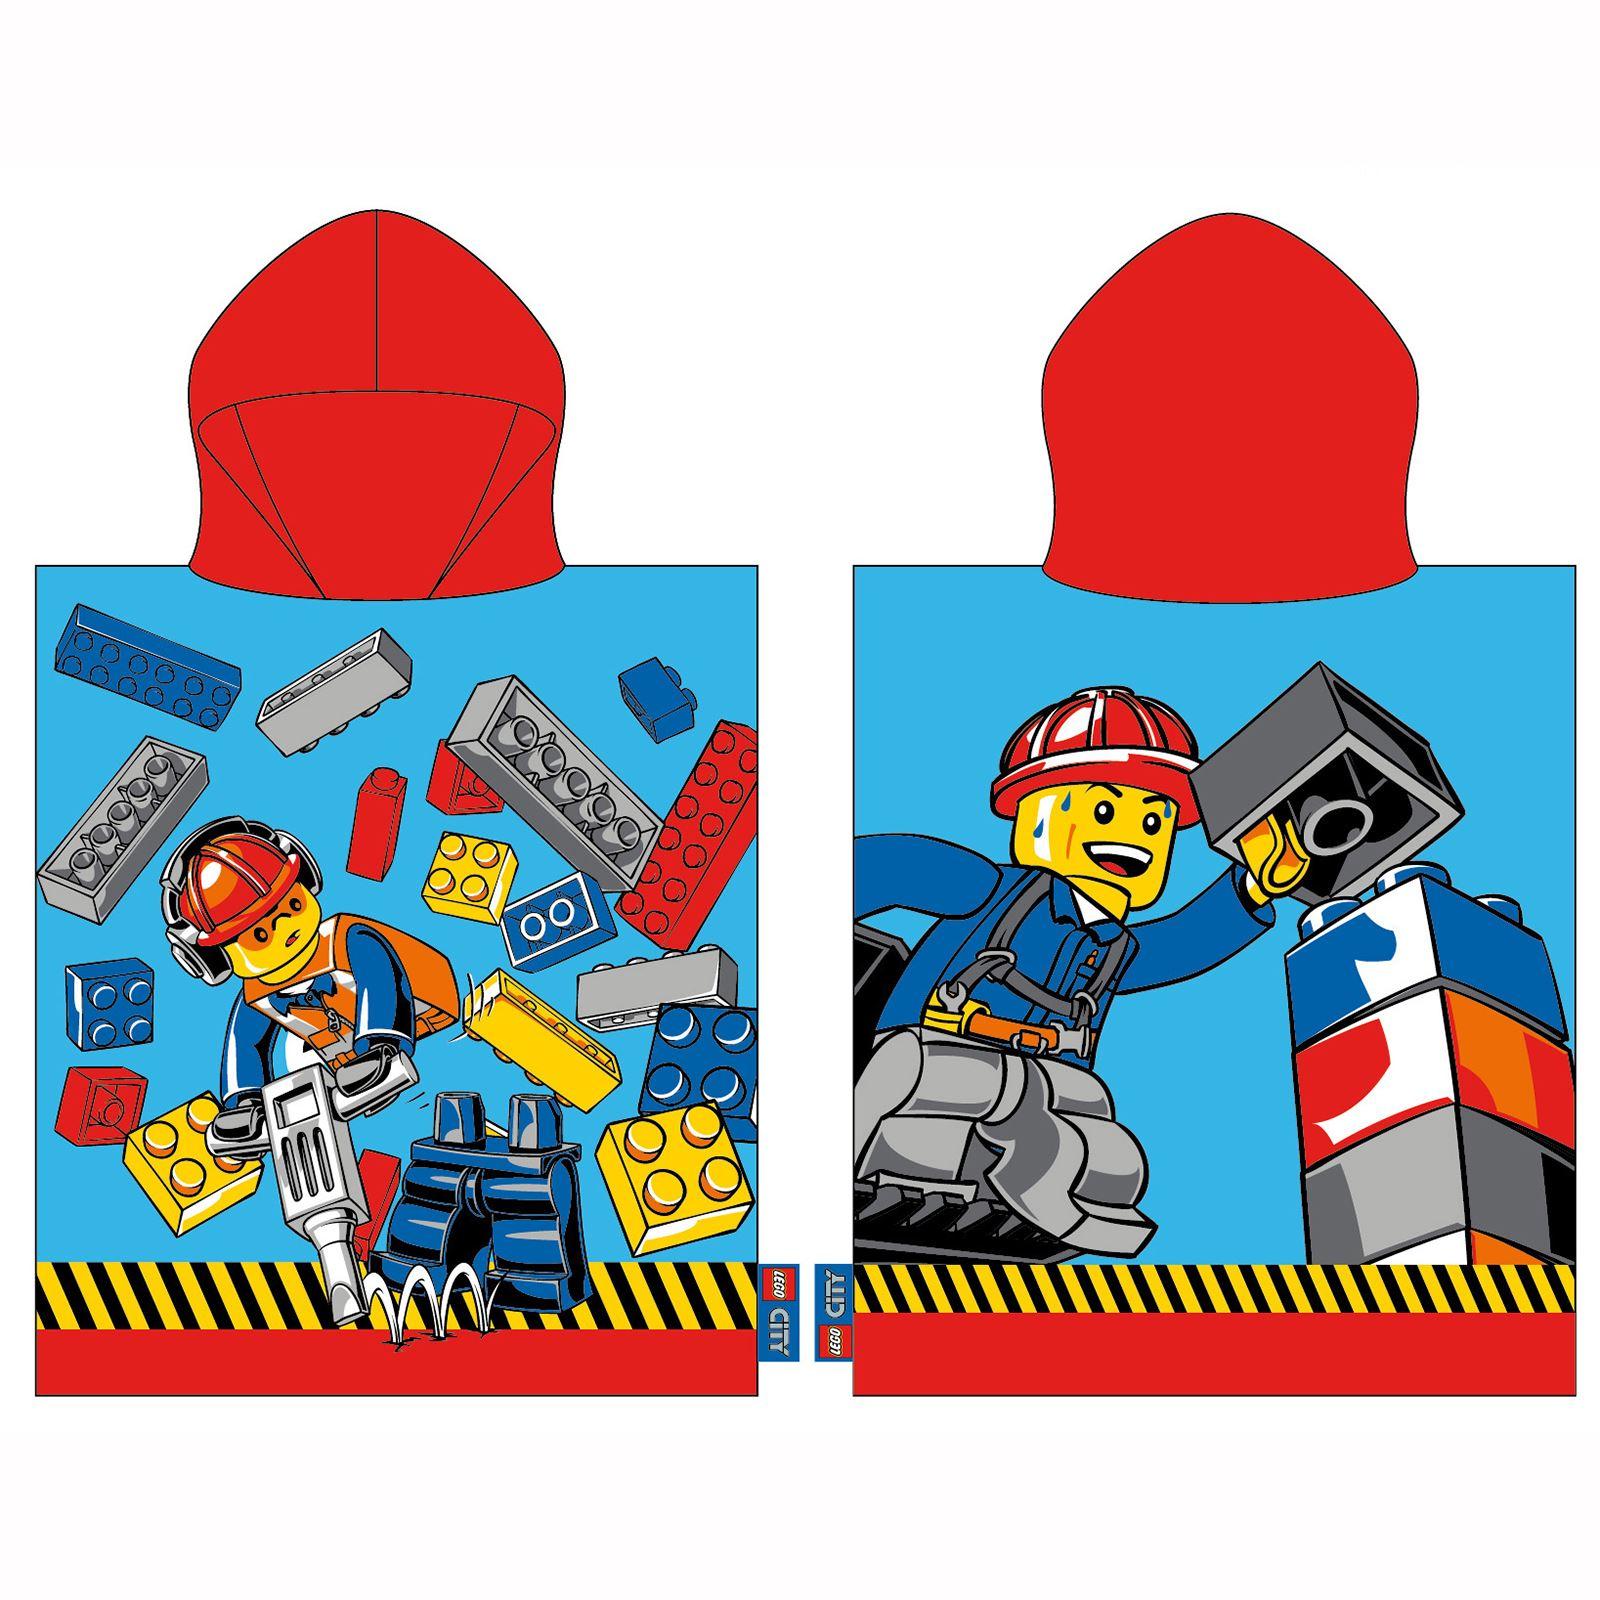 Beach Bedroom Furniture Bedroom Remodel Batman Bedroom Wallpaper Scandinavian Bedroom Curtains: LEGO TOWELS & PONCHOS CHILDRENS COTTON BEACH TOWEL STAR